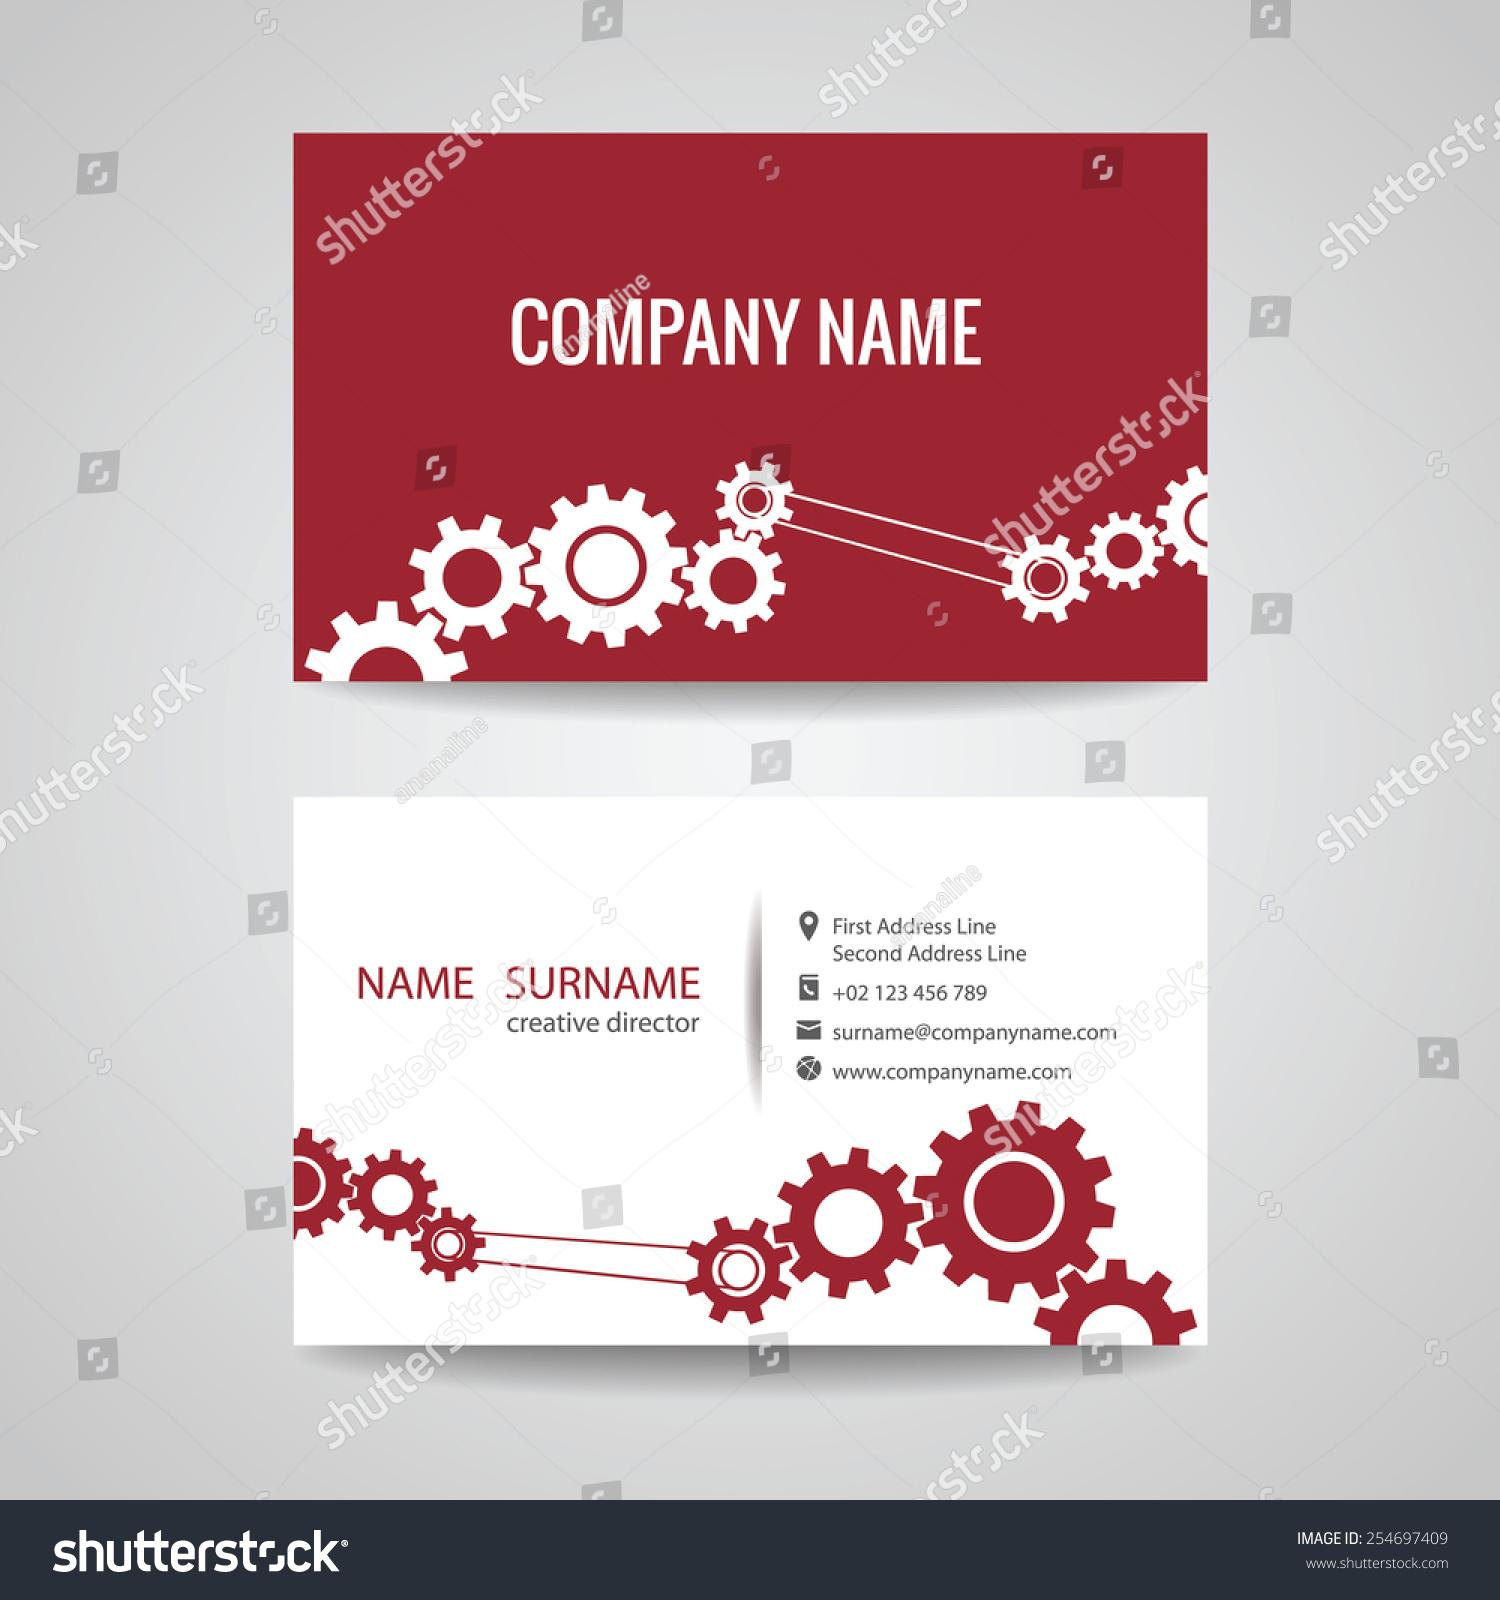 Business Card Engineer Mechanical Stock Photo (Photo, Vector ...